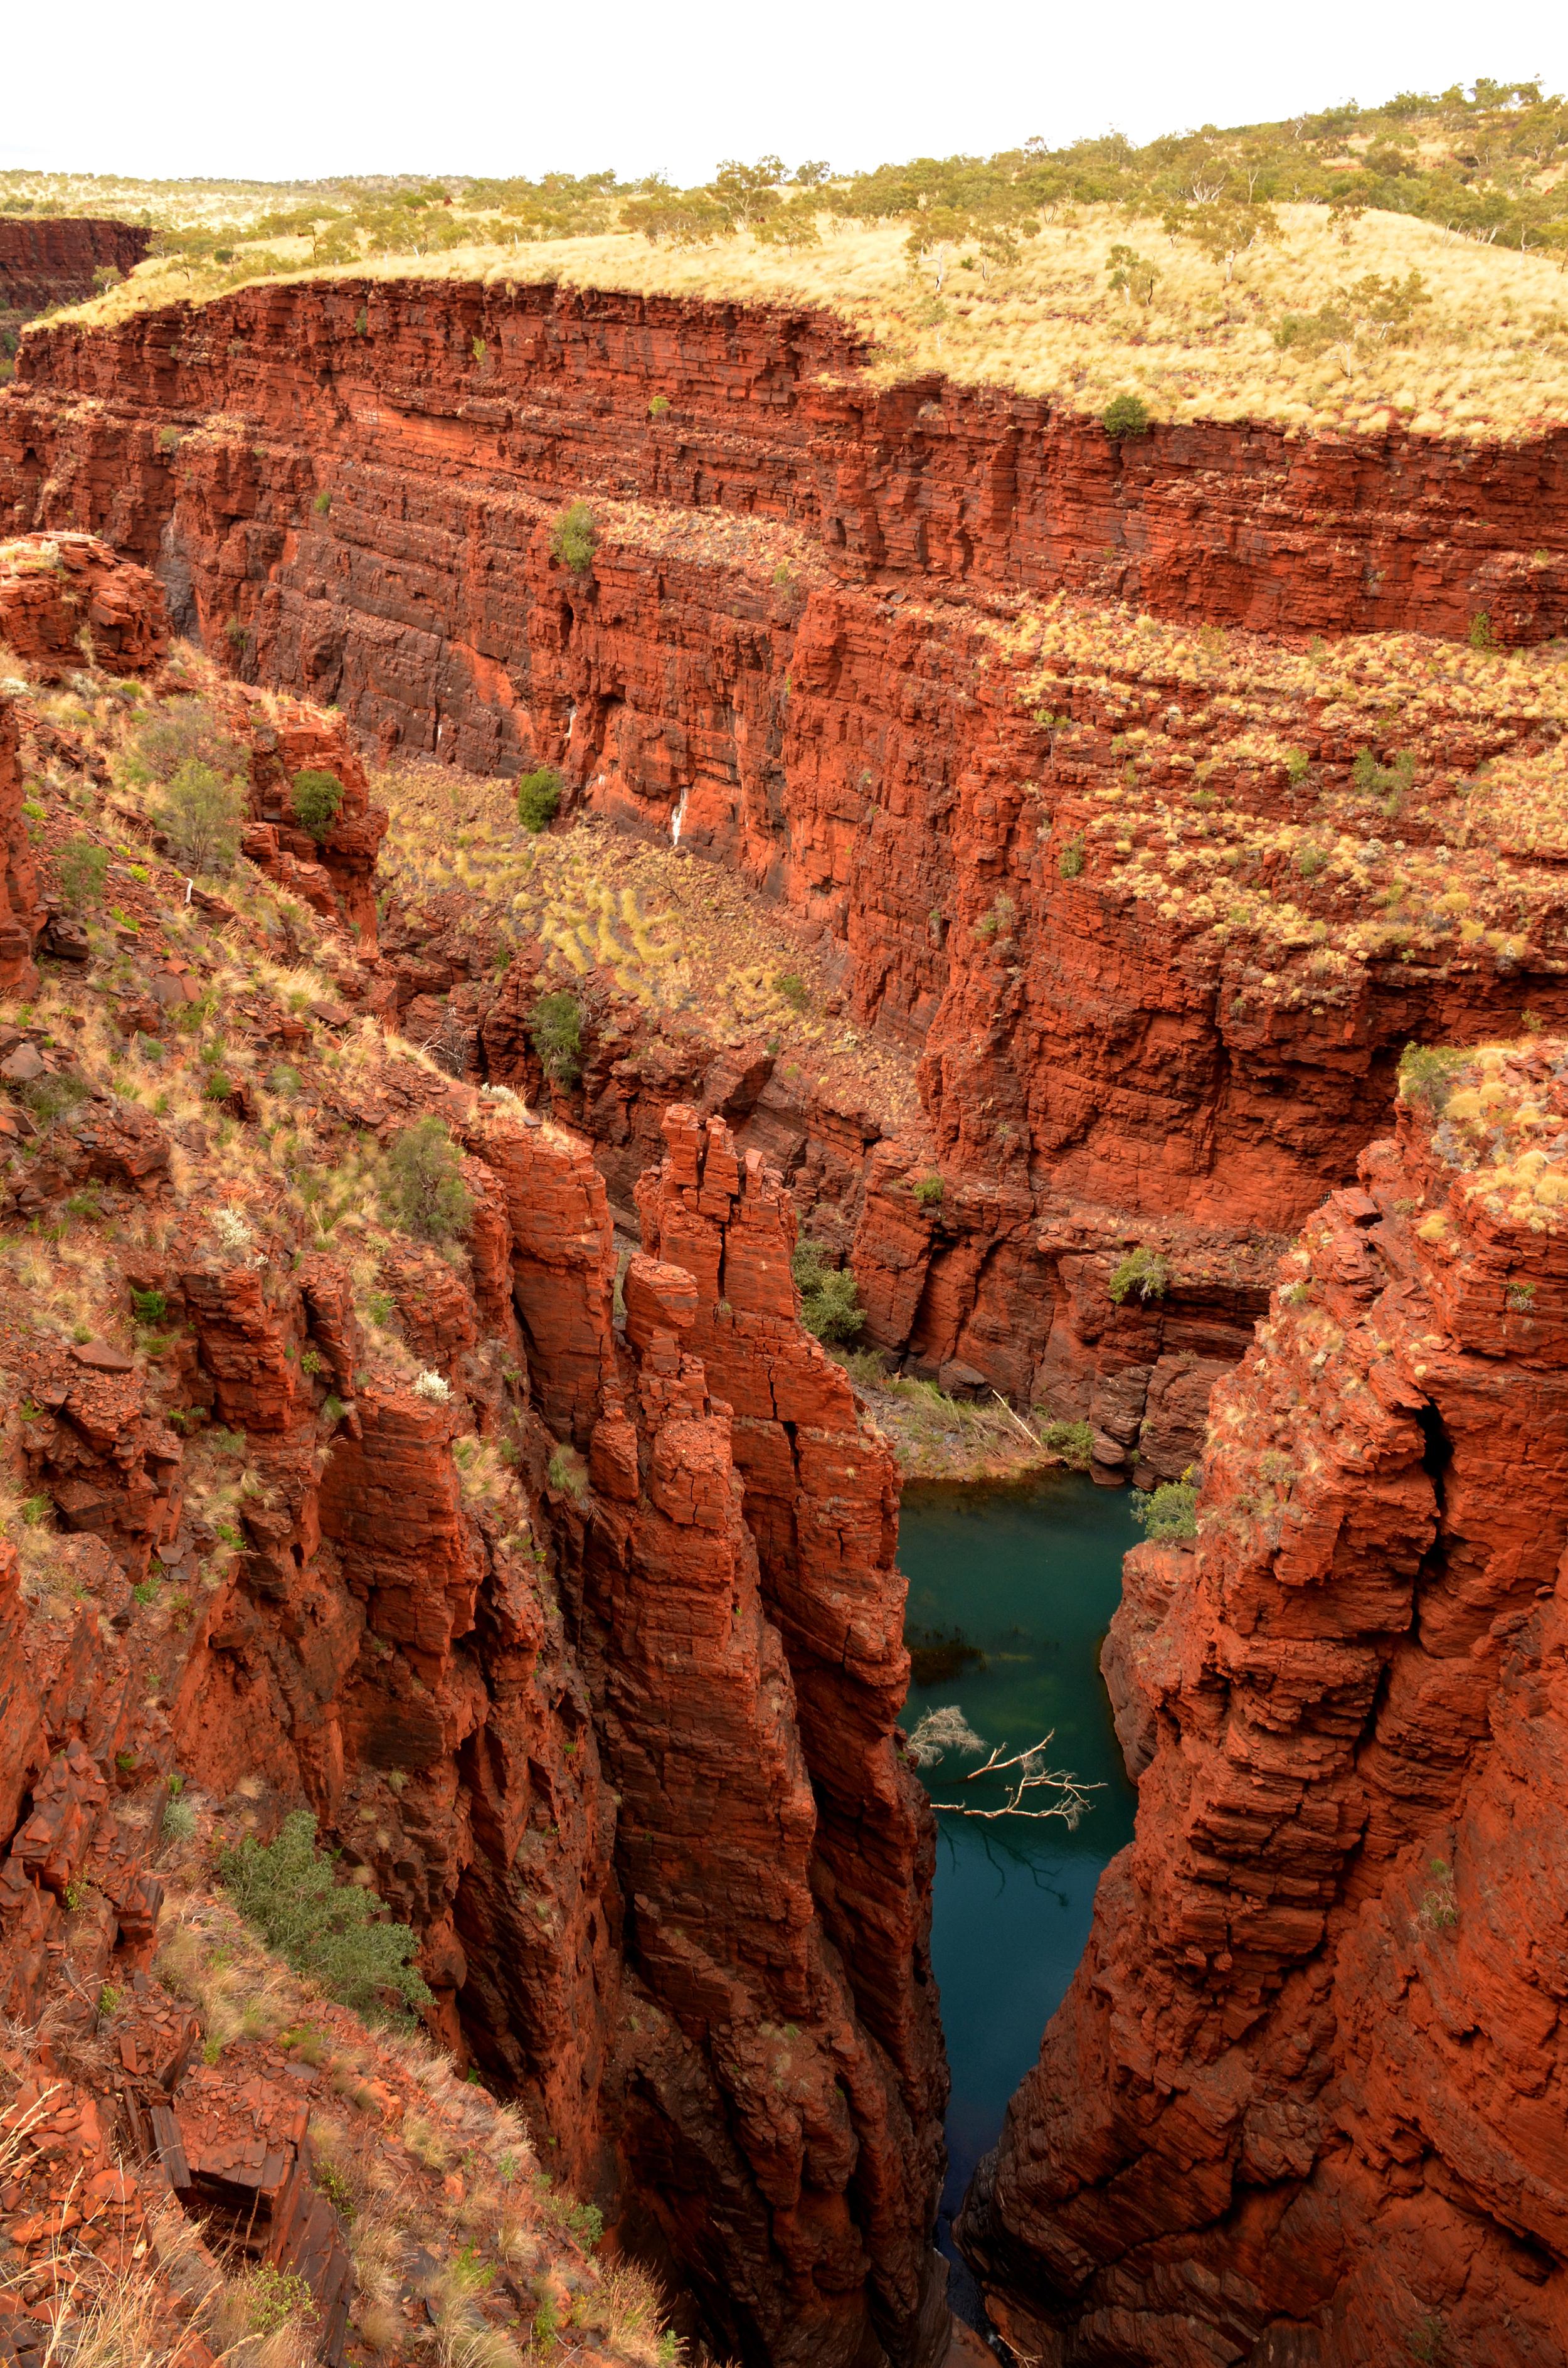 The canyons of Karijini